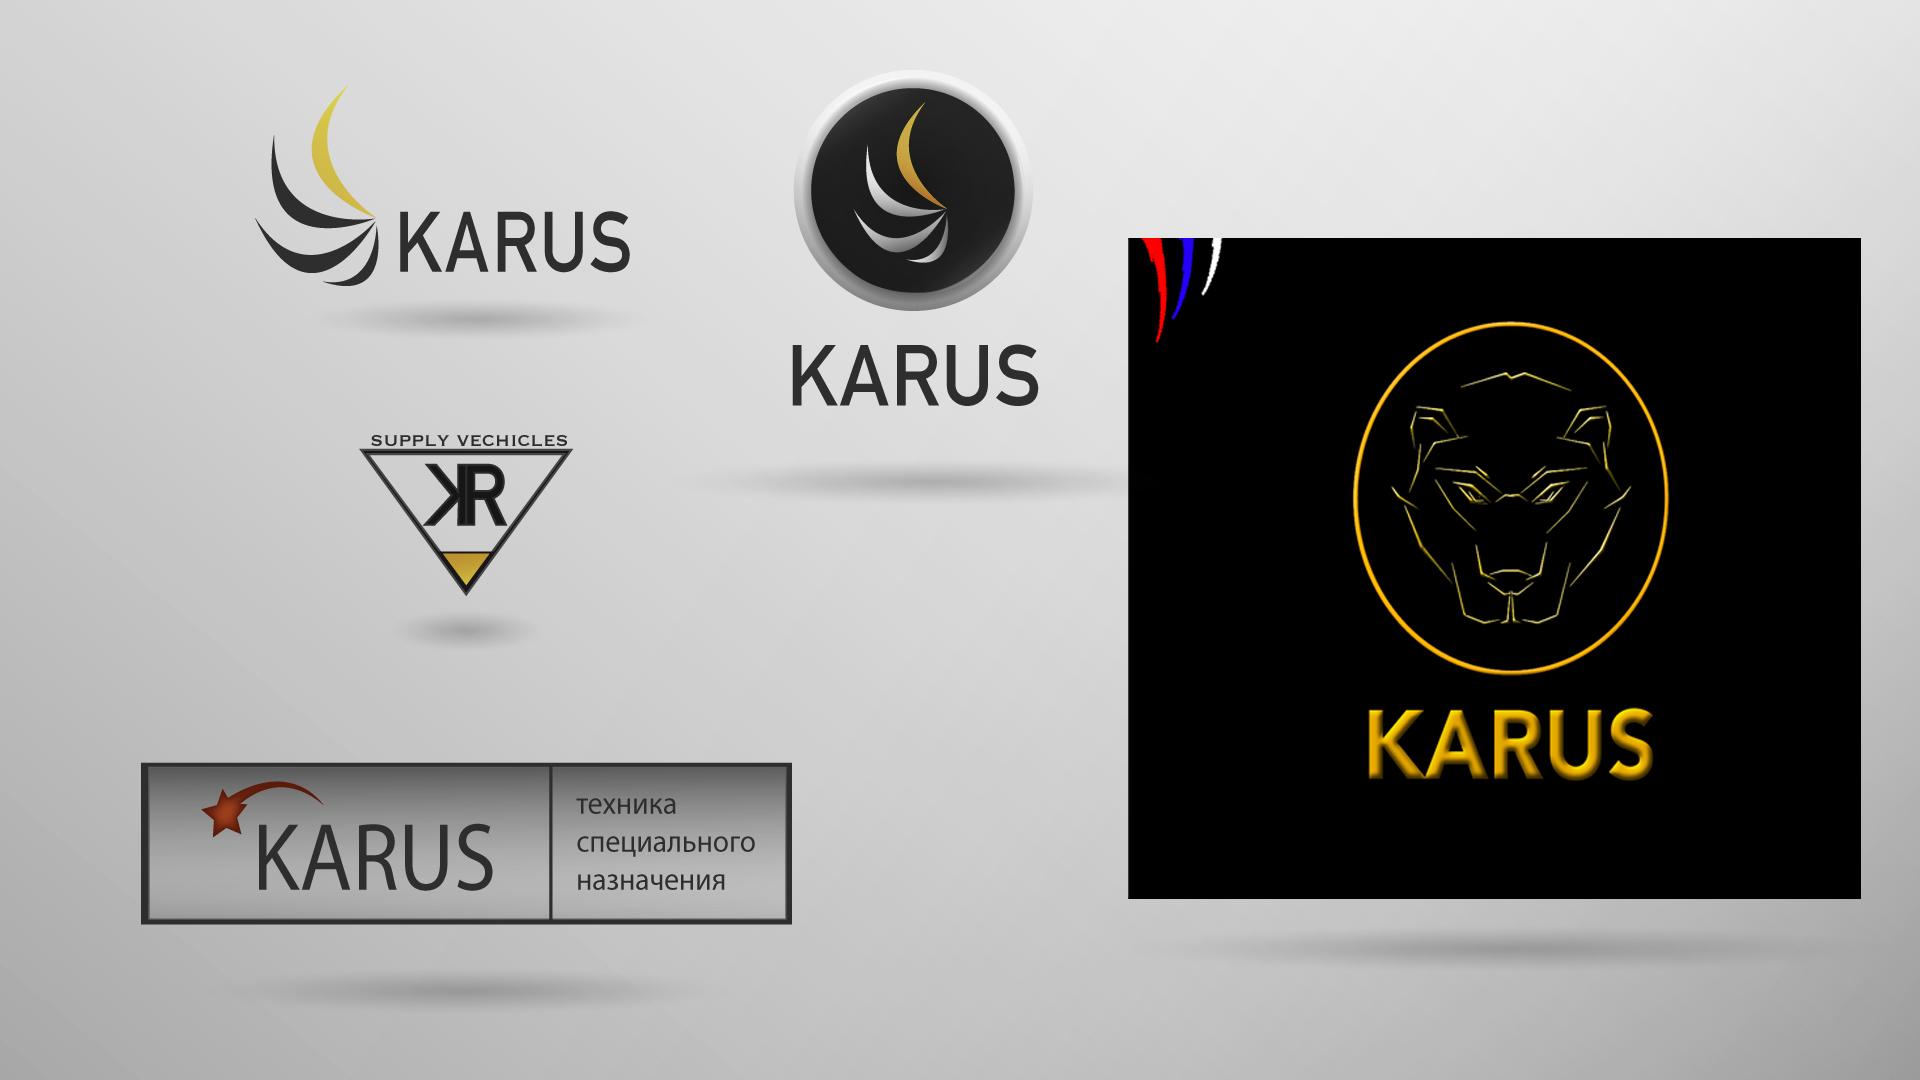 Разработка логотипа, фирменных цветов и фирменного знака фото f_890533989d86716f.jpg